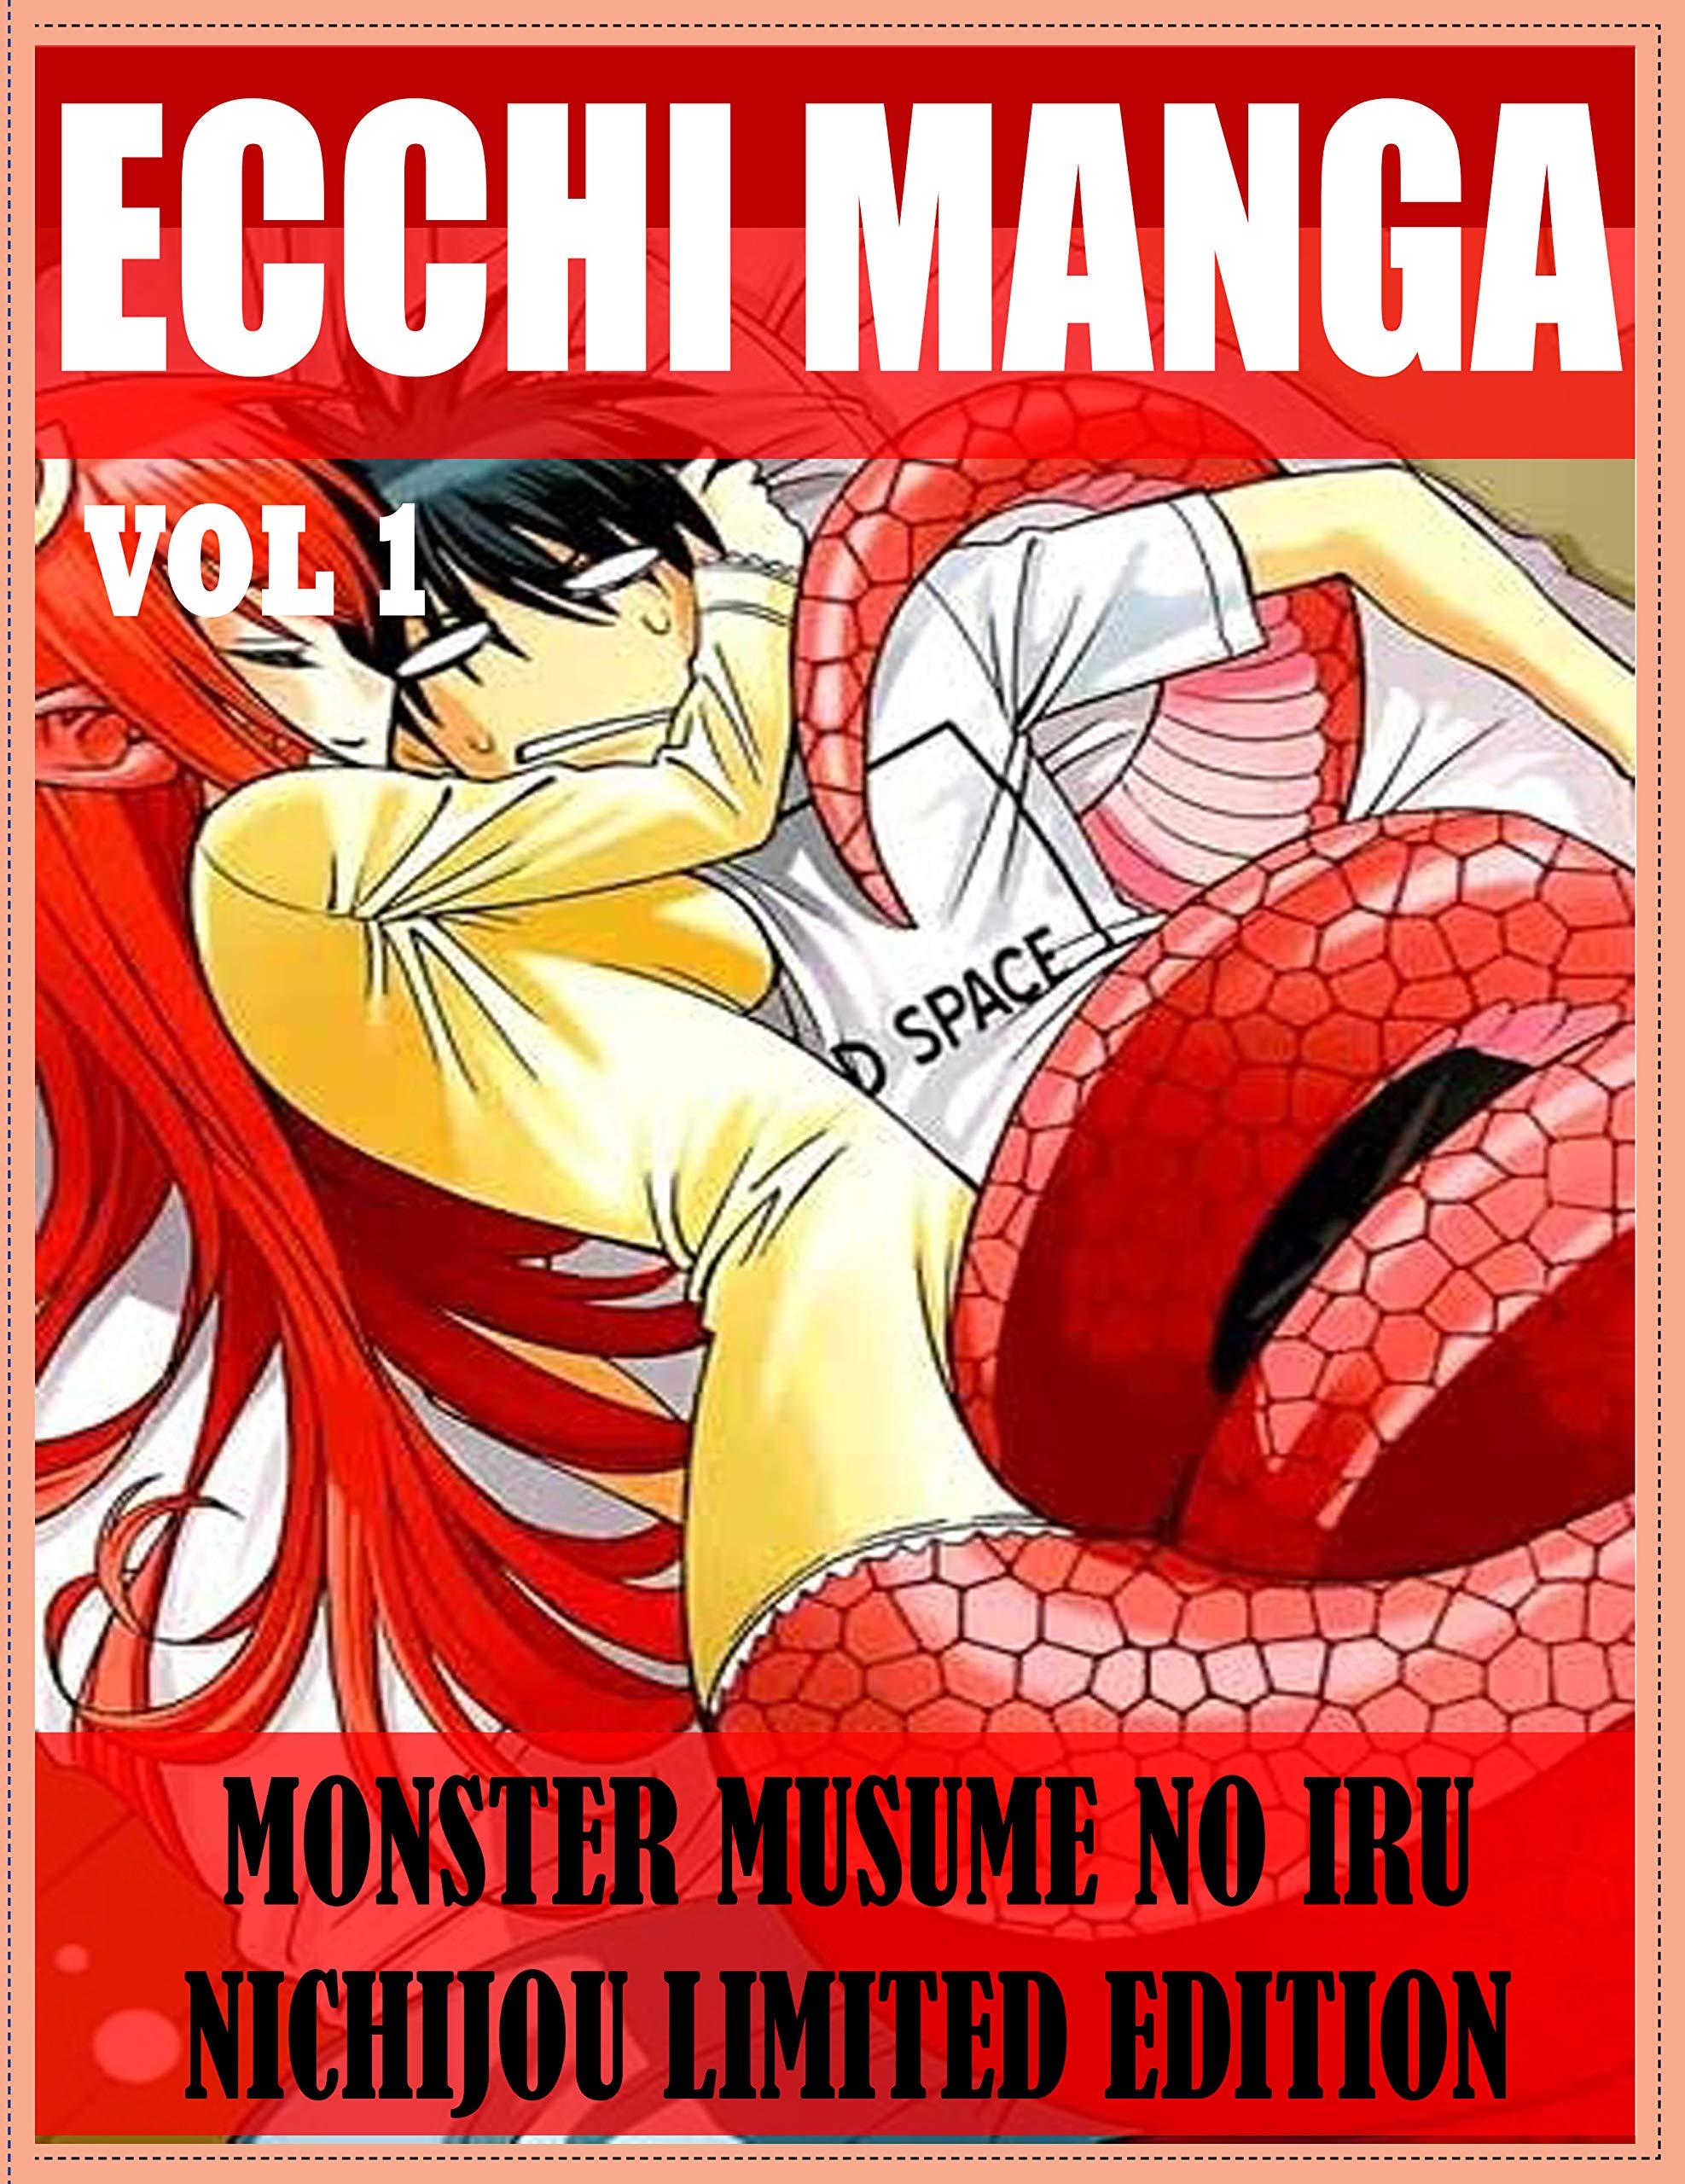 The Perfect Edition Ecchi Manga Monster Musume No Iru Nichijou Limited Edition: Ecchi Comedy Monster Musume No Iru Nichijou Complete Series Volume 1